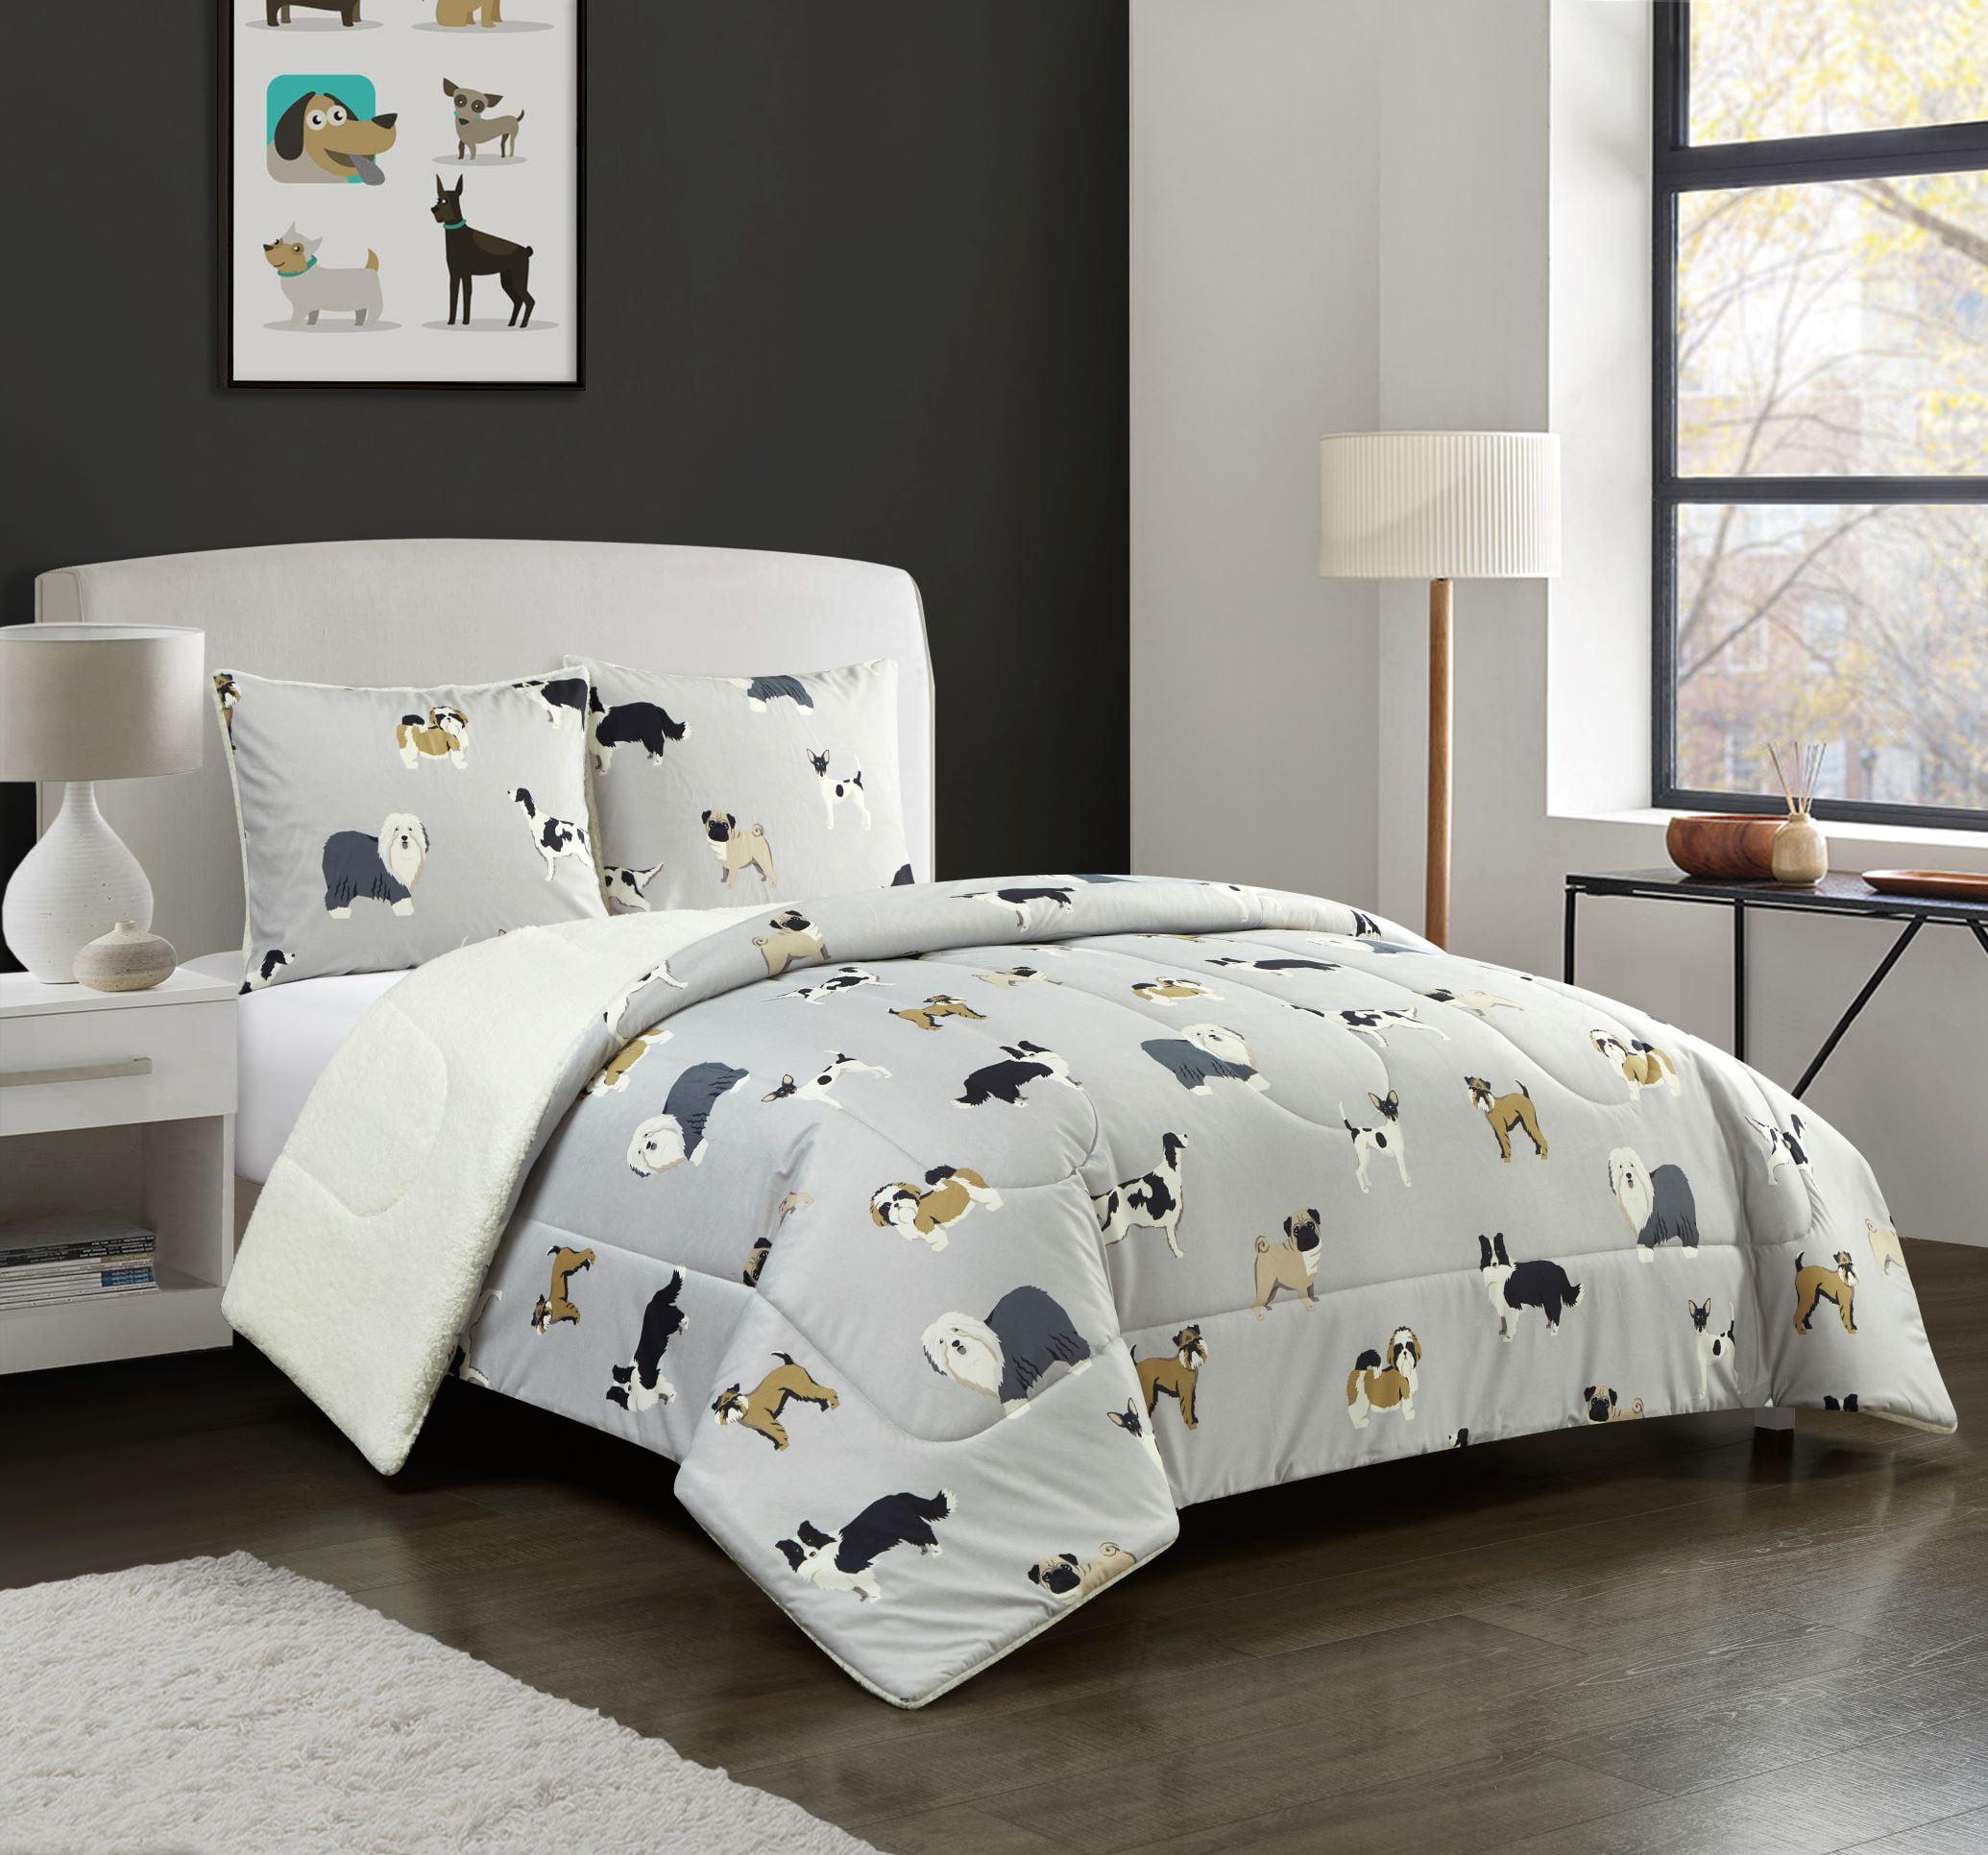 Mainstays Dog Cozy Flannel Reverse To Super Soft Sherpa Comforter Set King Walmart Com Walmart Com